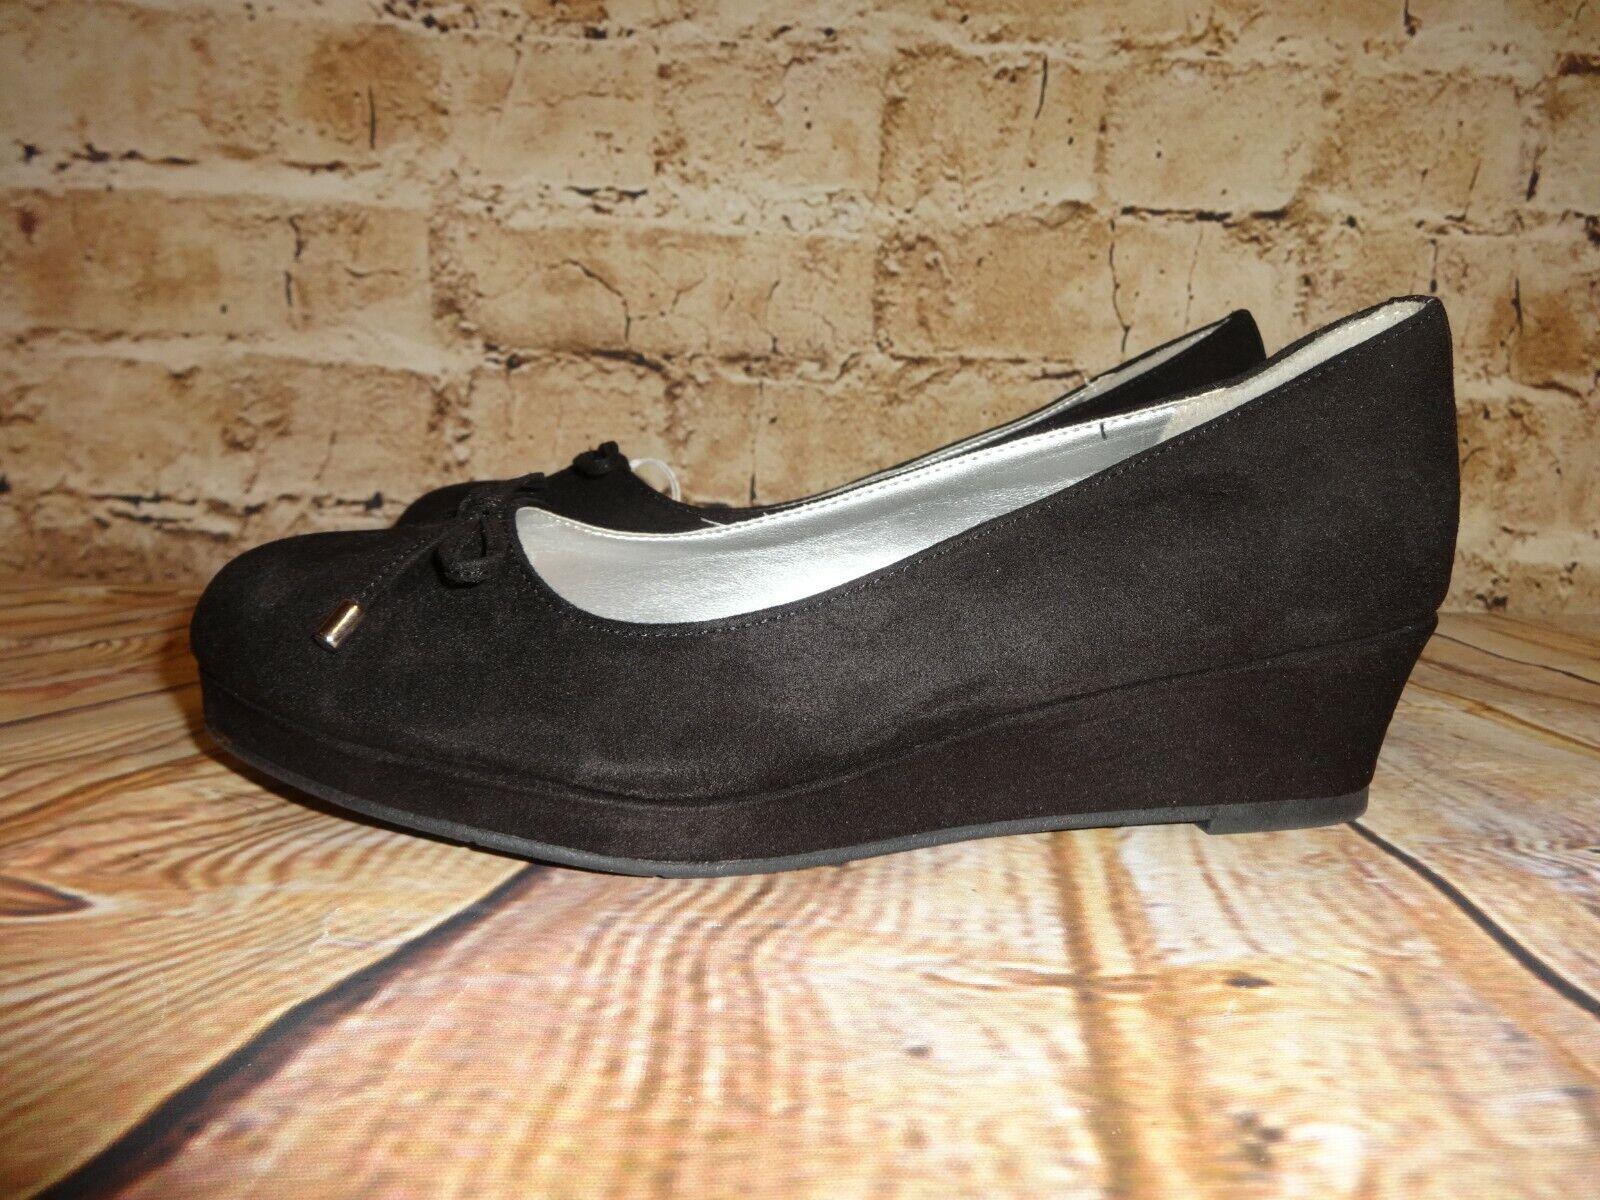 American Eagle Shoes Black Suede Feel SZ 5 M Closed Toe Bows Wedge Heel